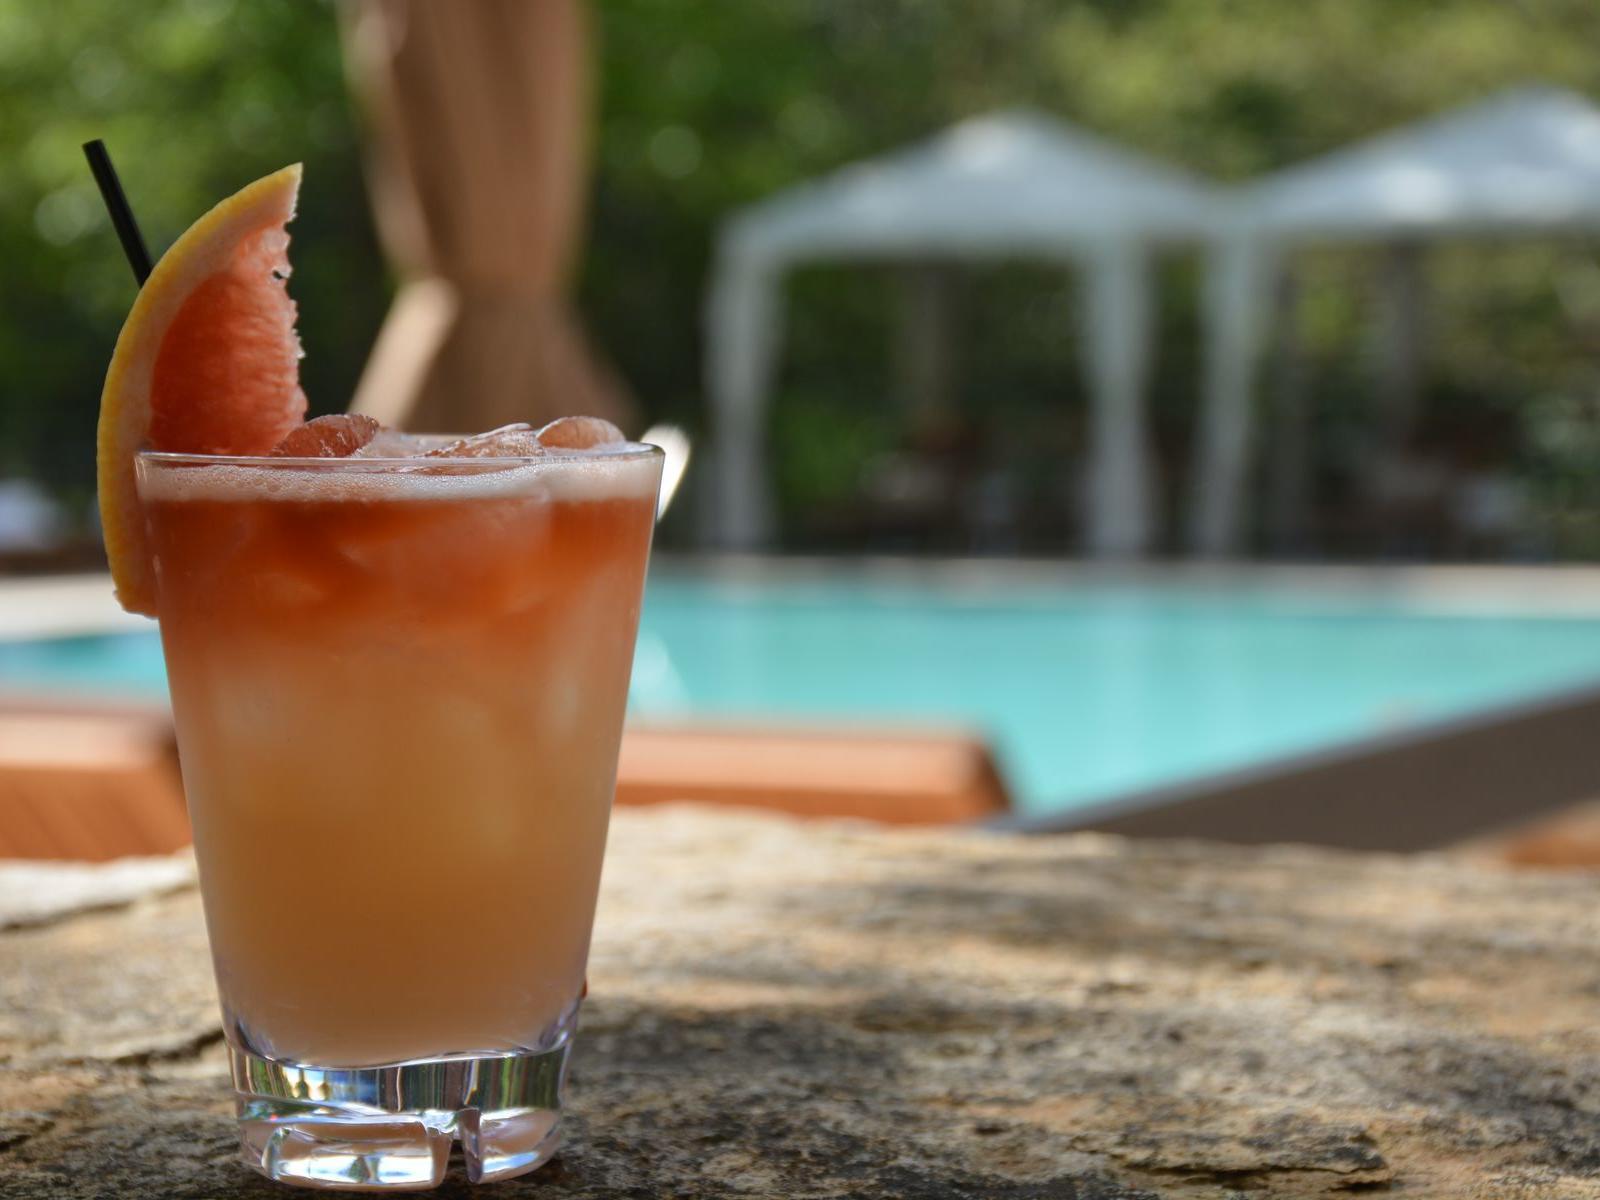 orange cocktail by poolside